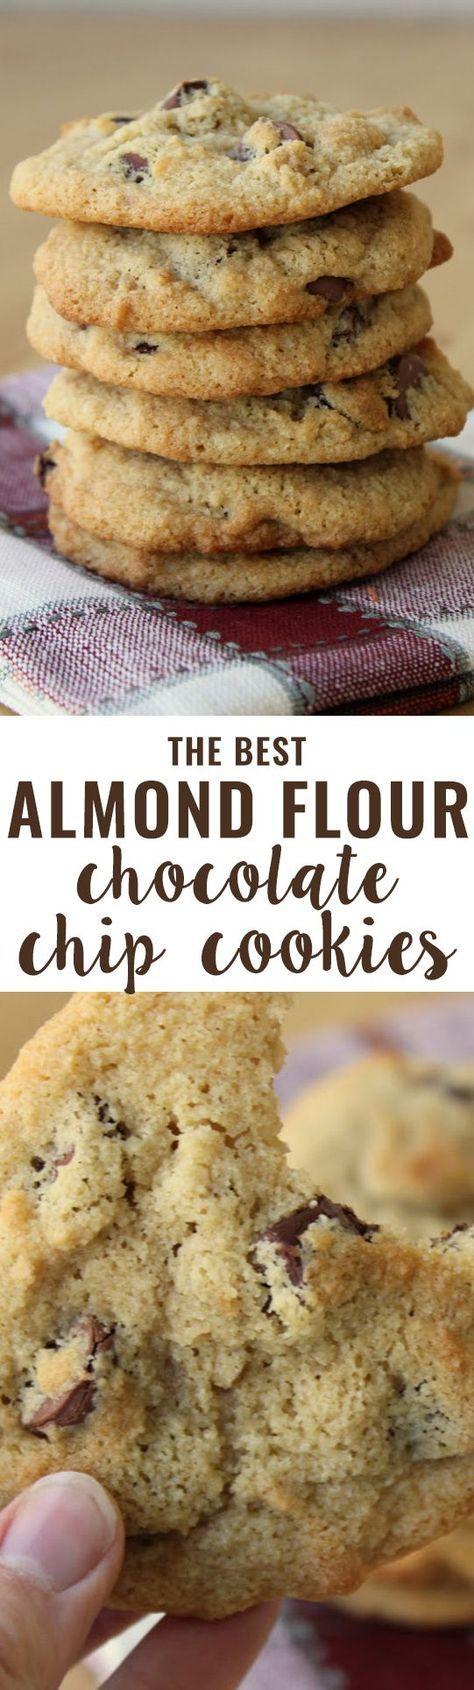 Almond Flour Chocolate Chip Cookies Grain Free